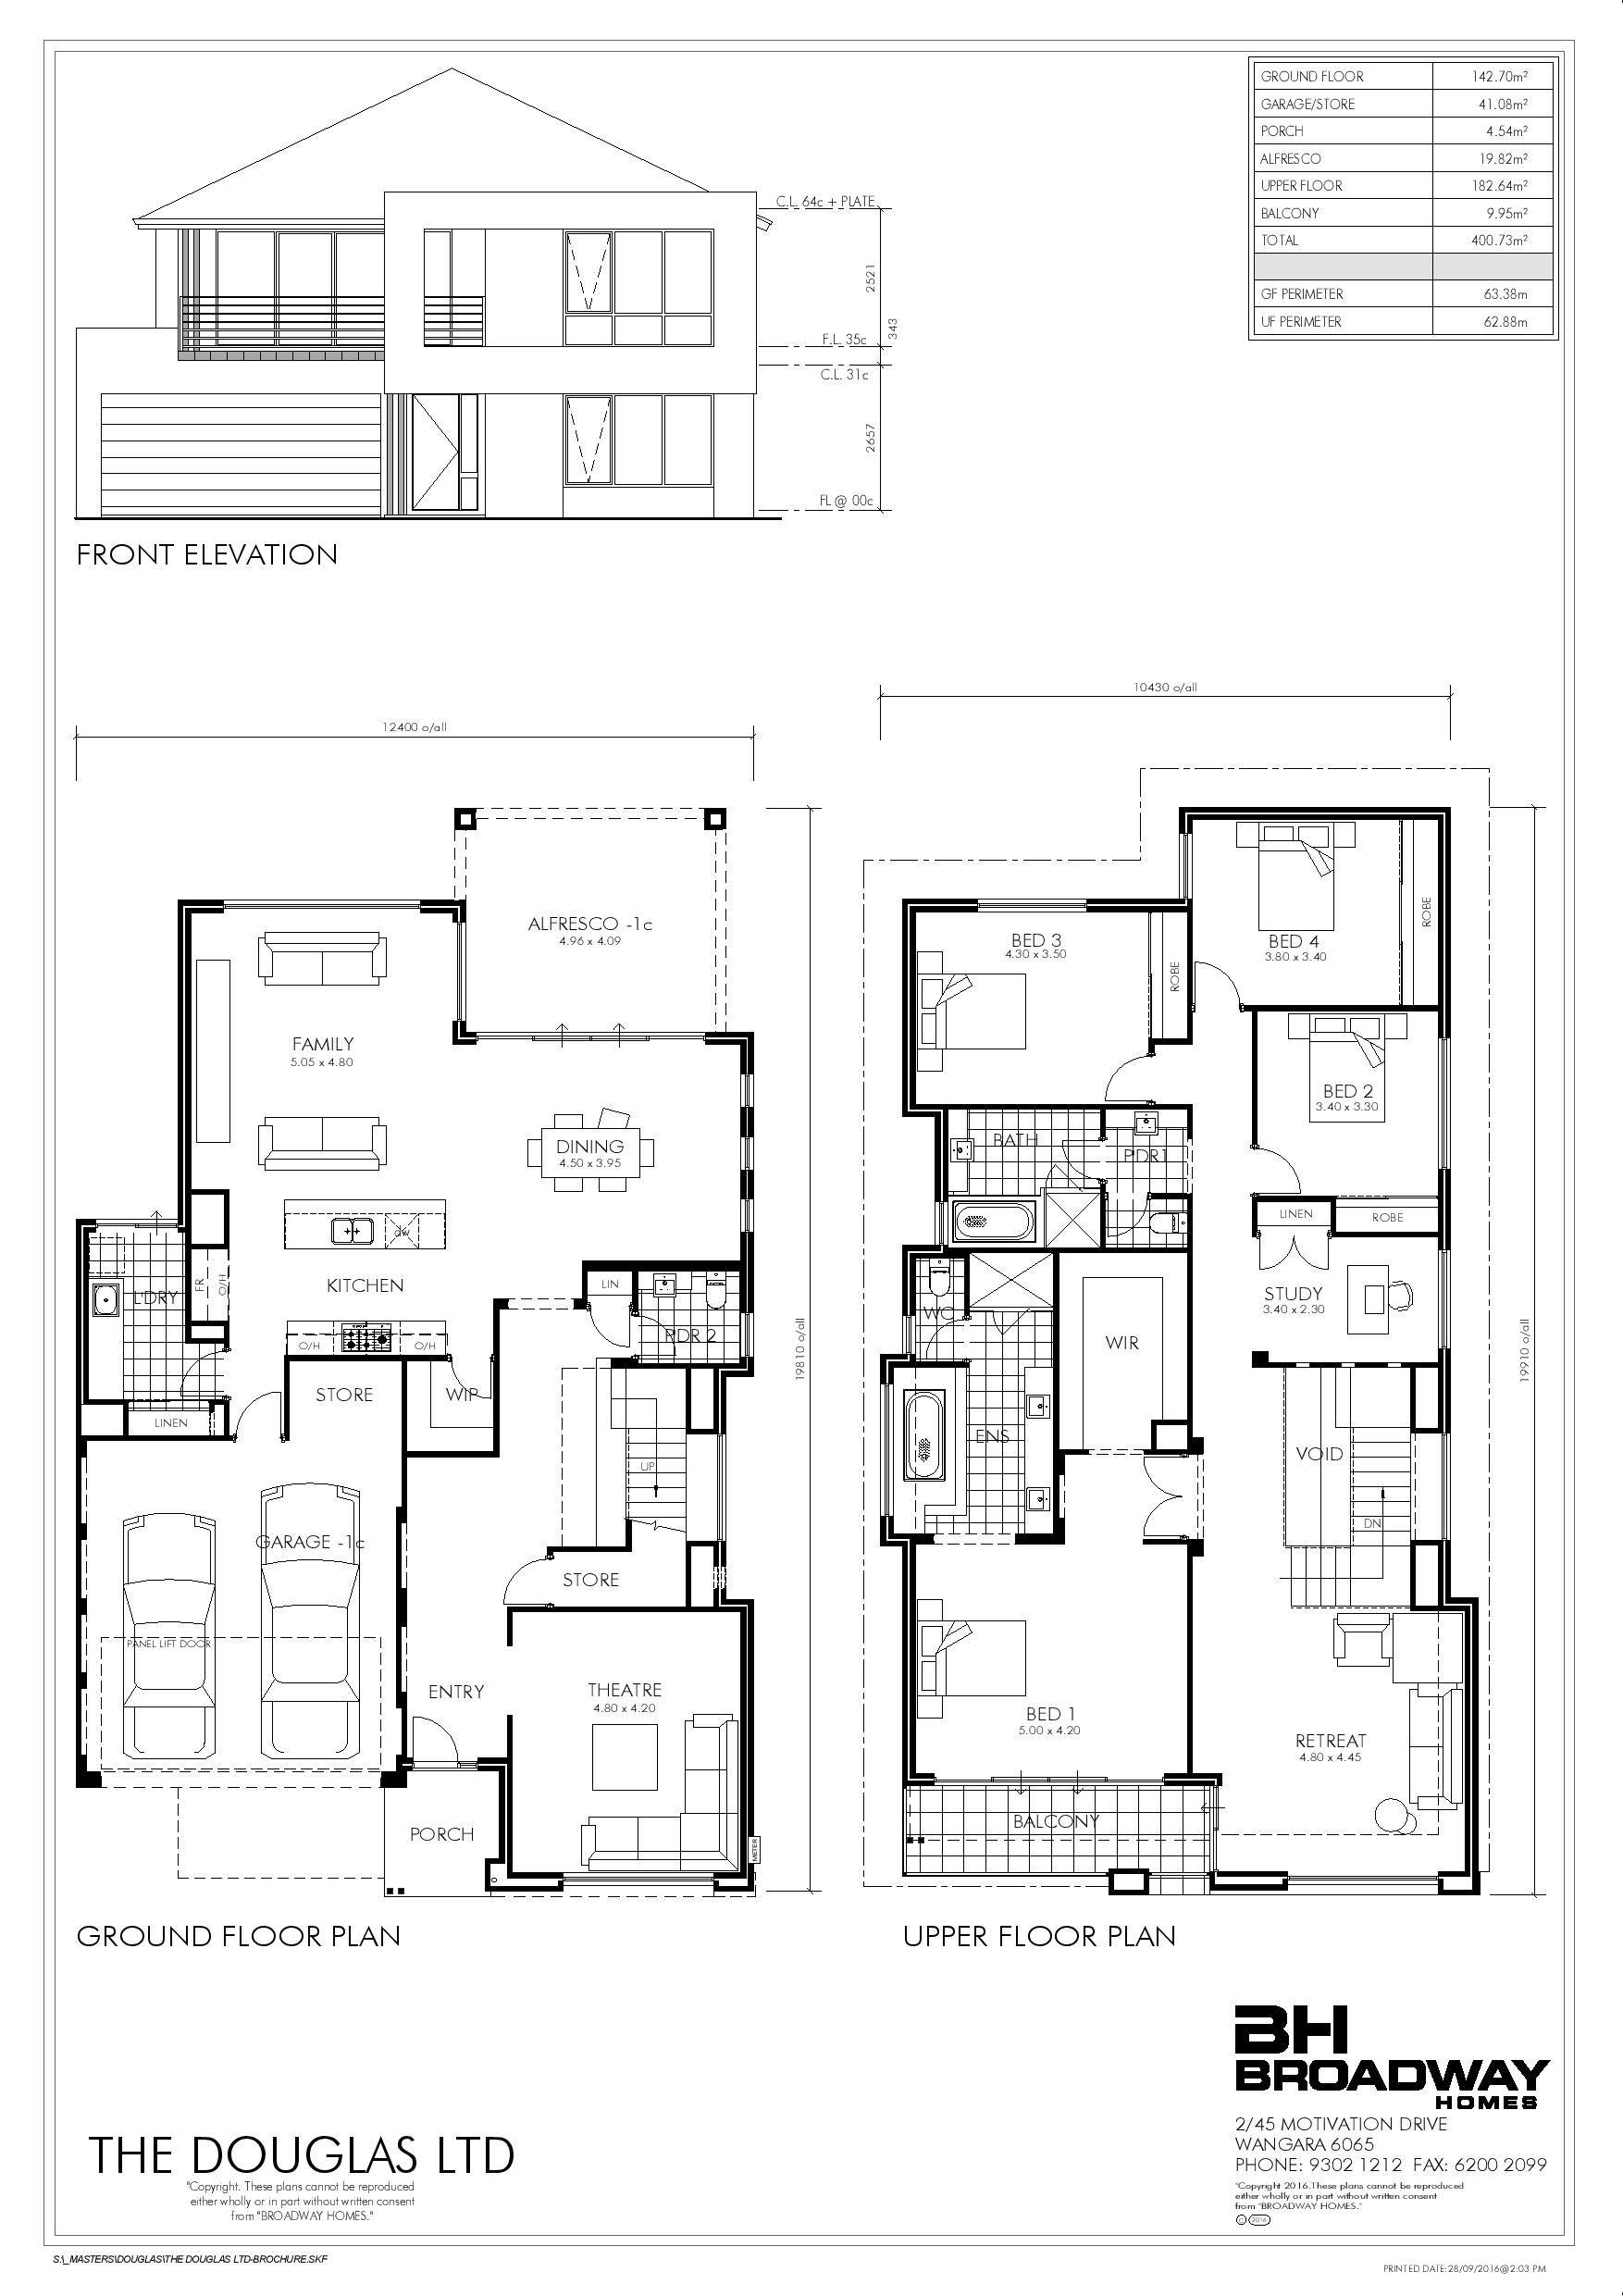 Plan01478663639g 17542481 dream plans pinterest house house malvernweather Images